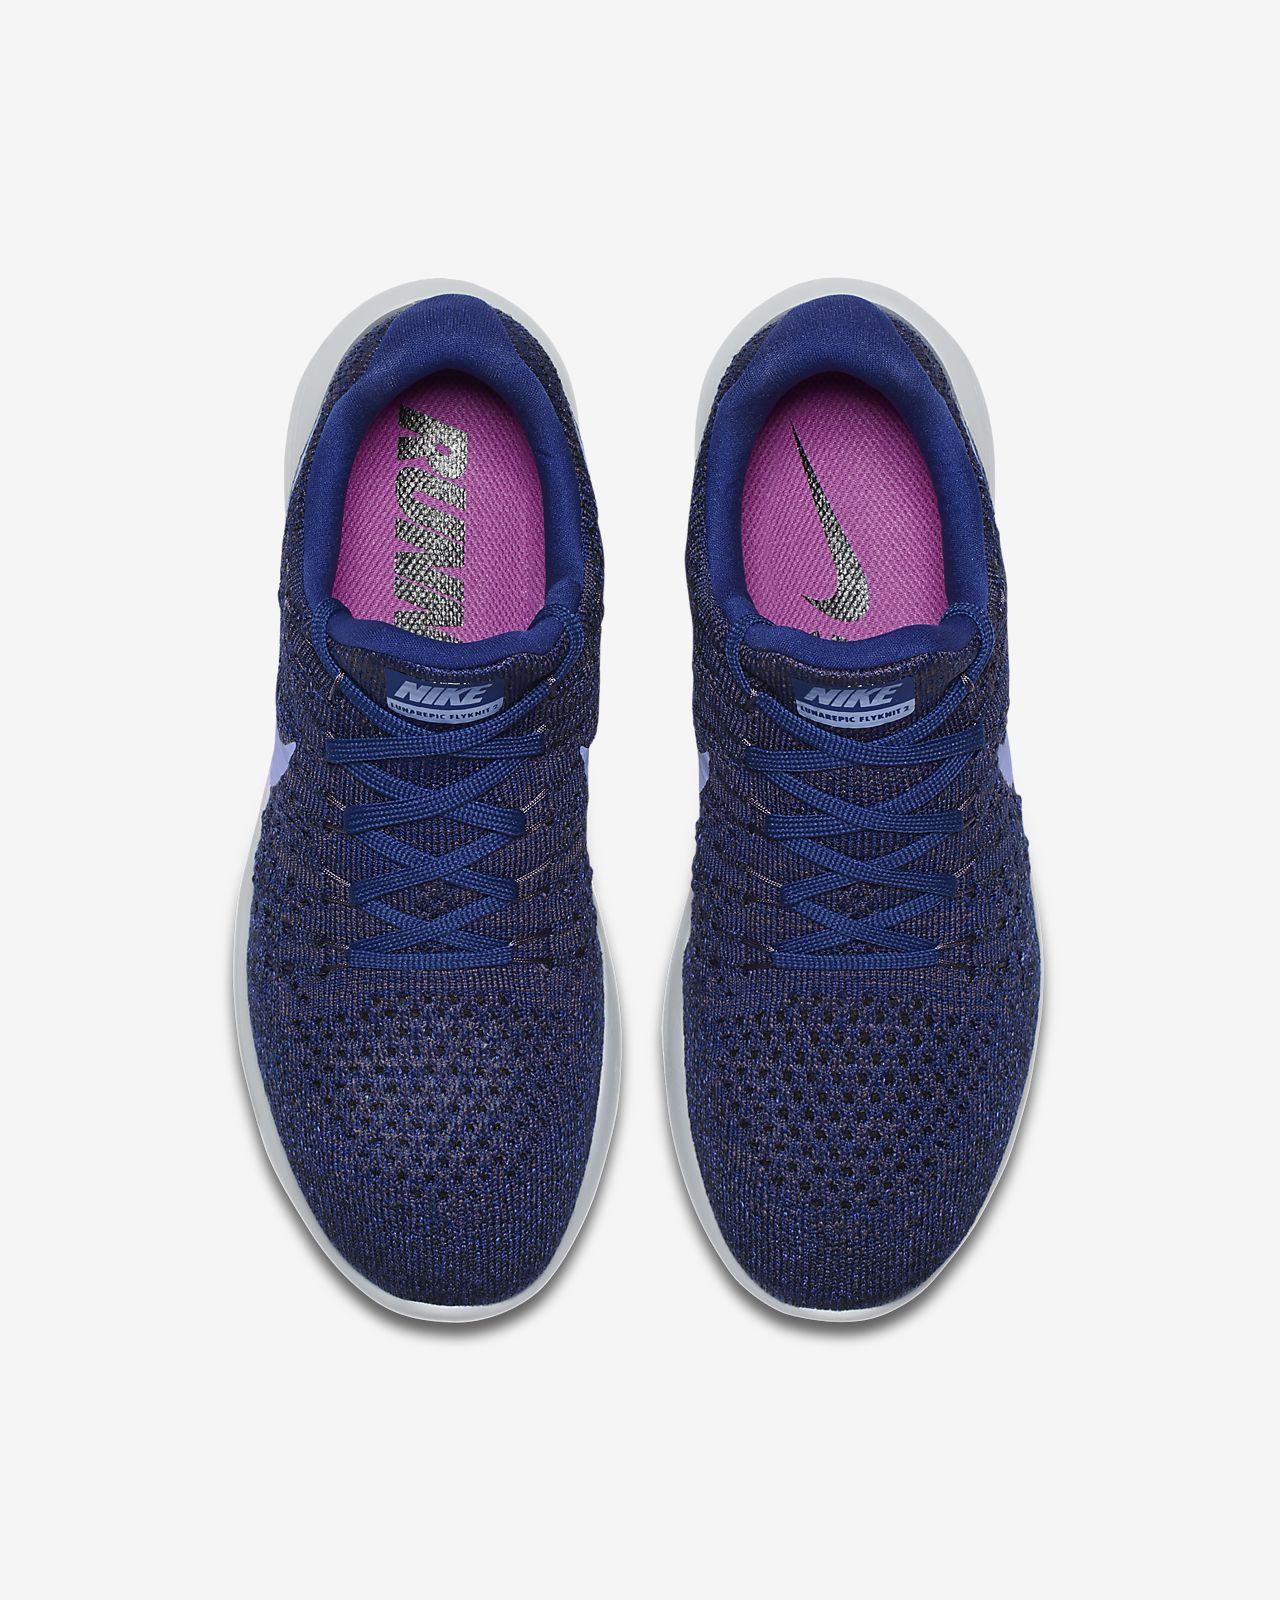 72dd01e712395 Nike LunarEpic Low Flyknit 2 Women s Running Shoe. Nike.com ID